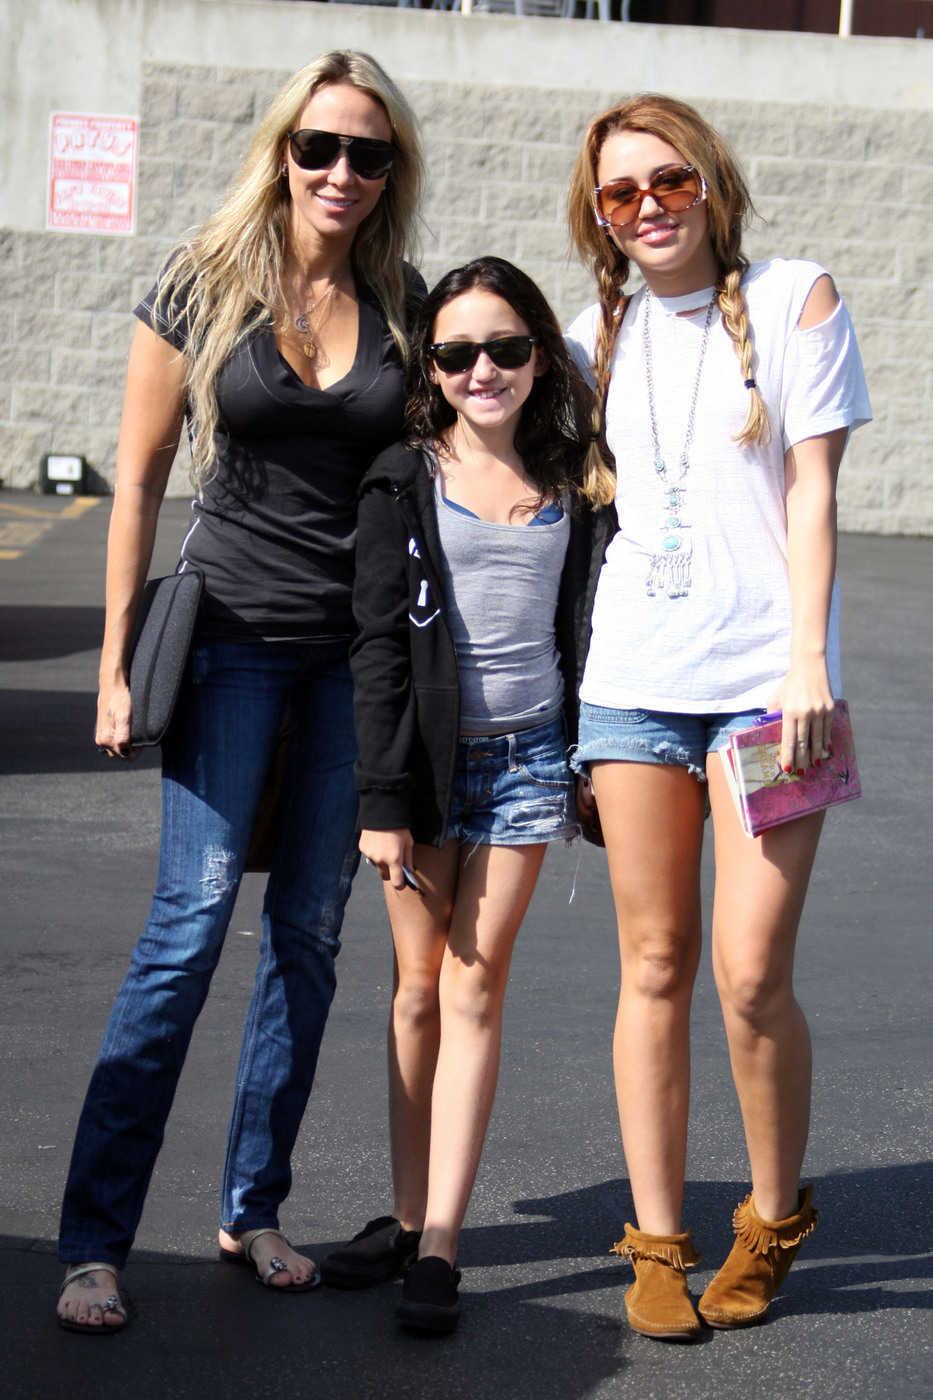 Miley Cyrus mom and sister